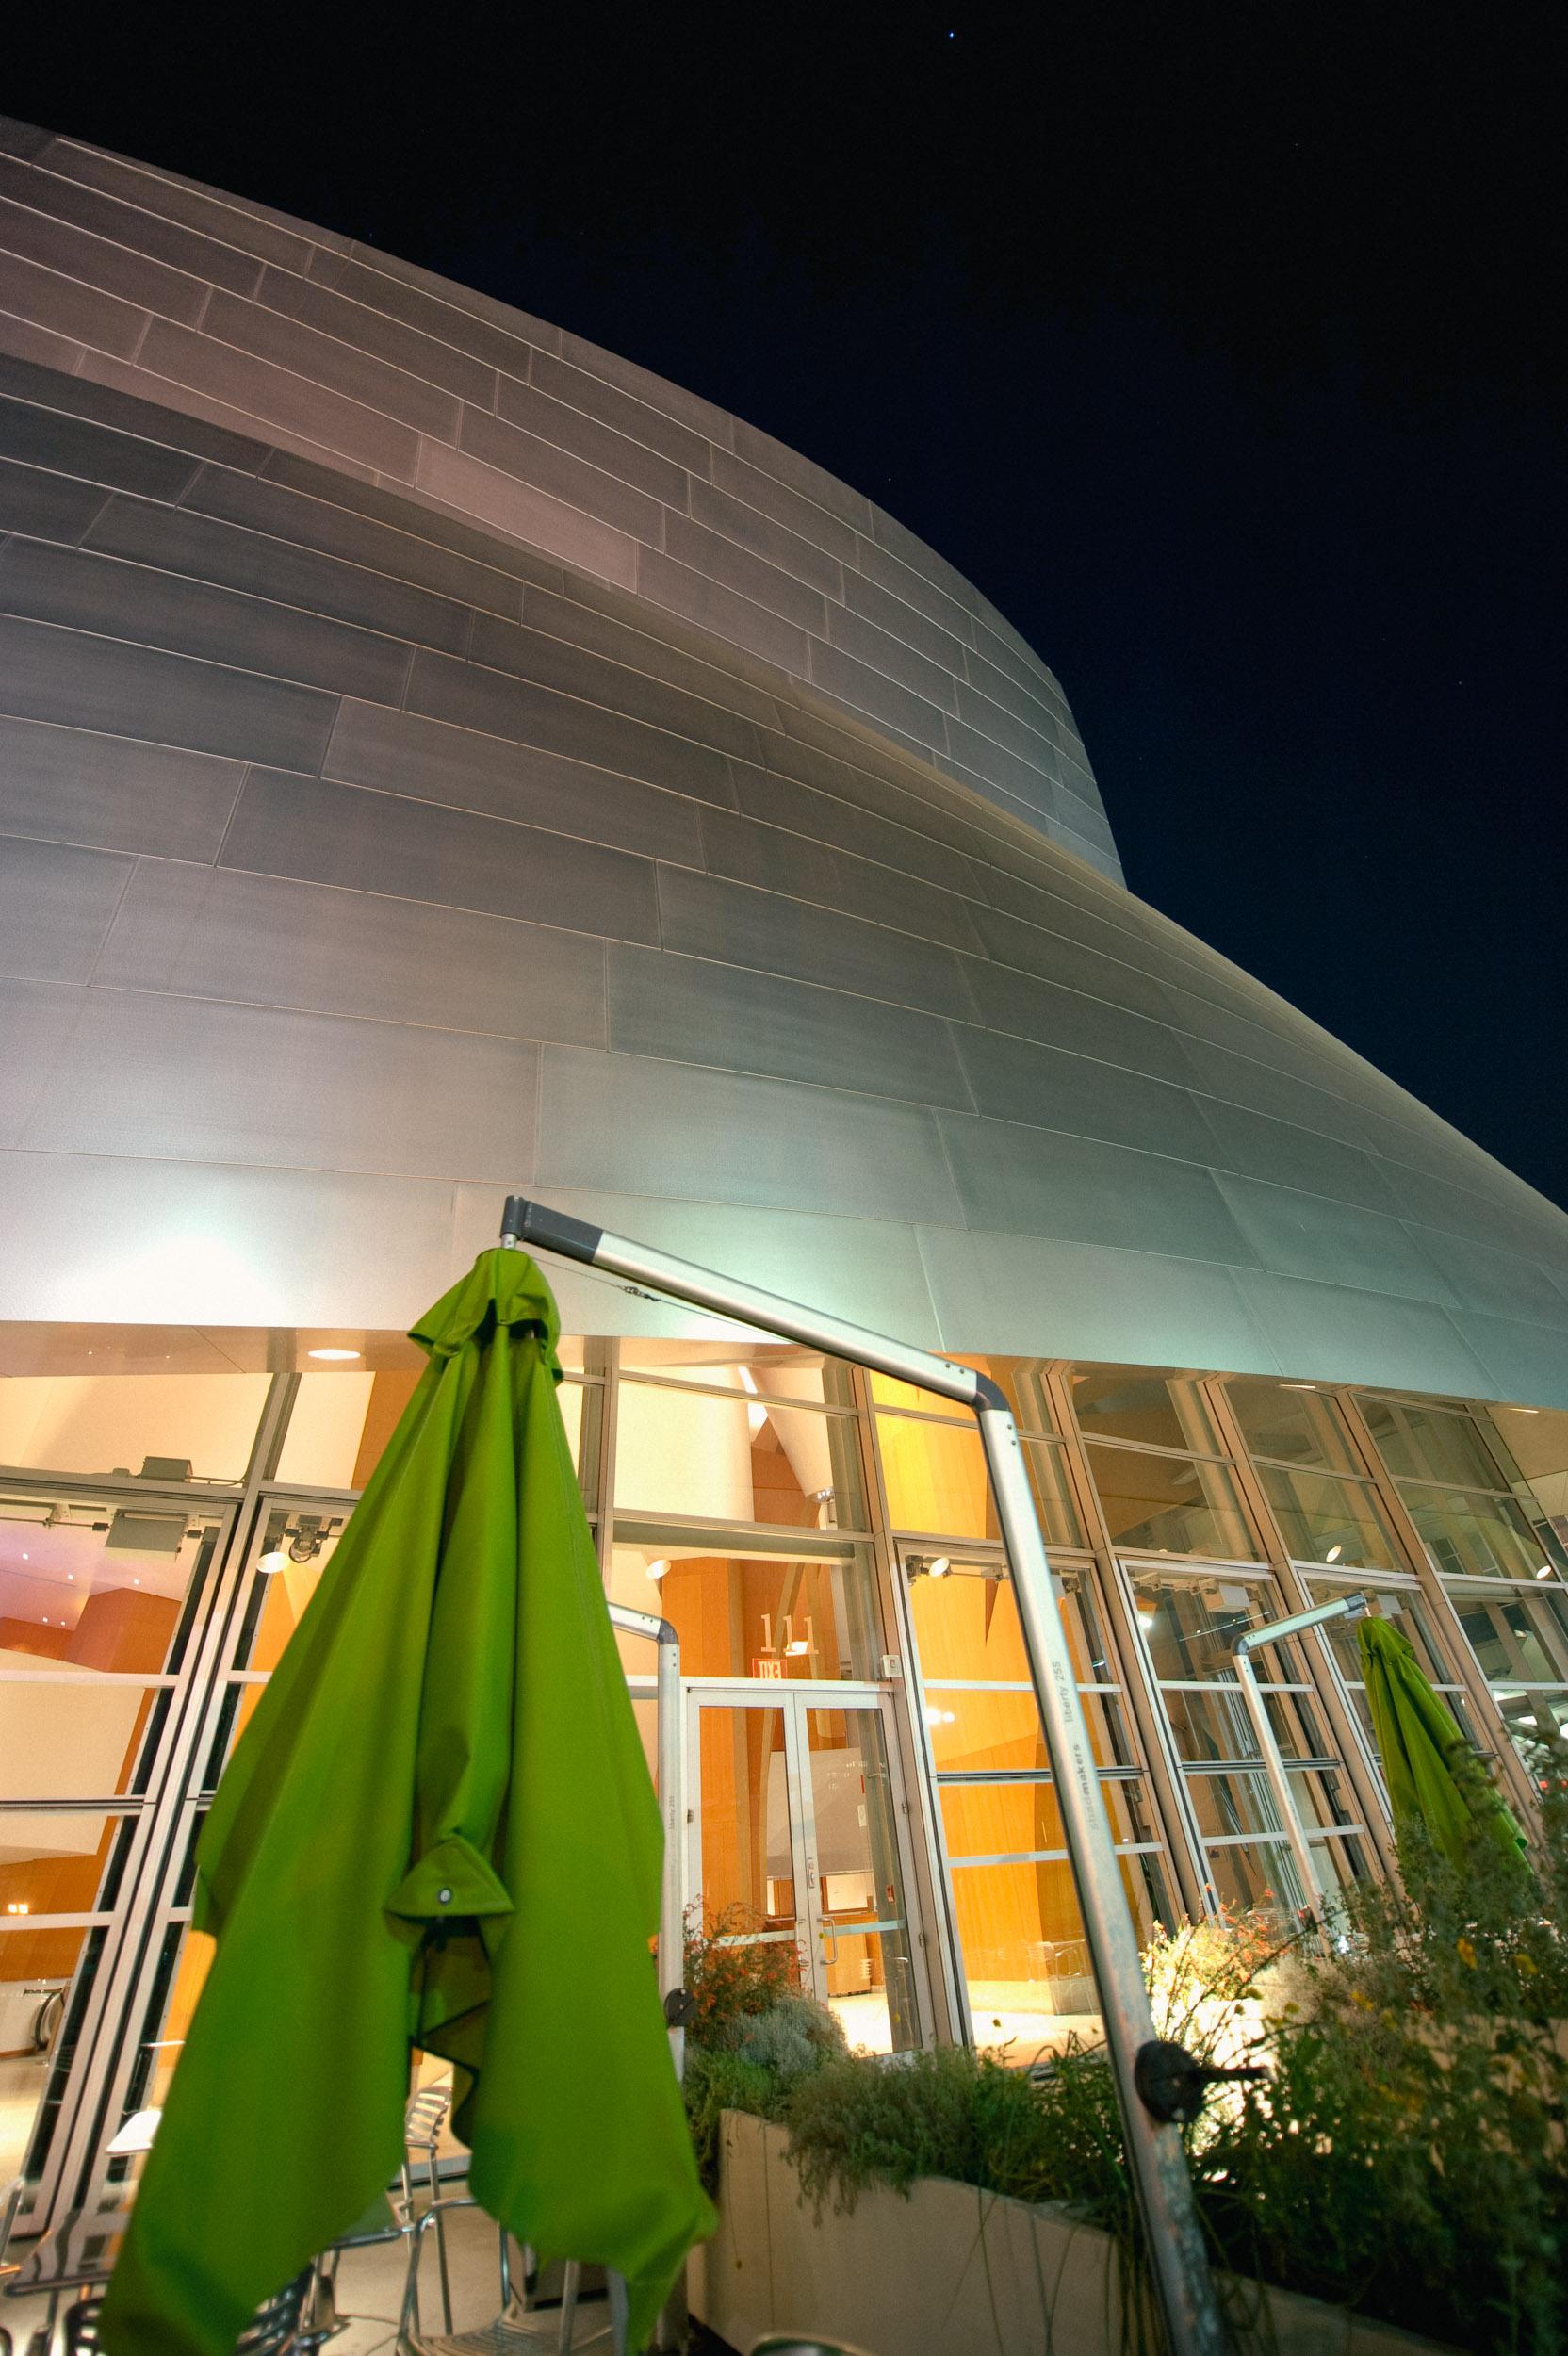 concerthall07_2500.jpg